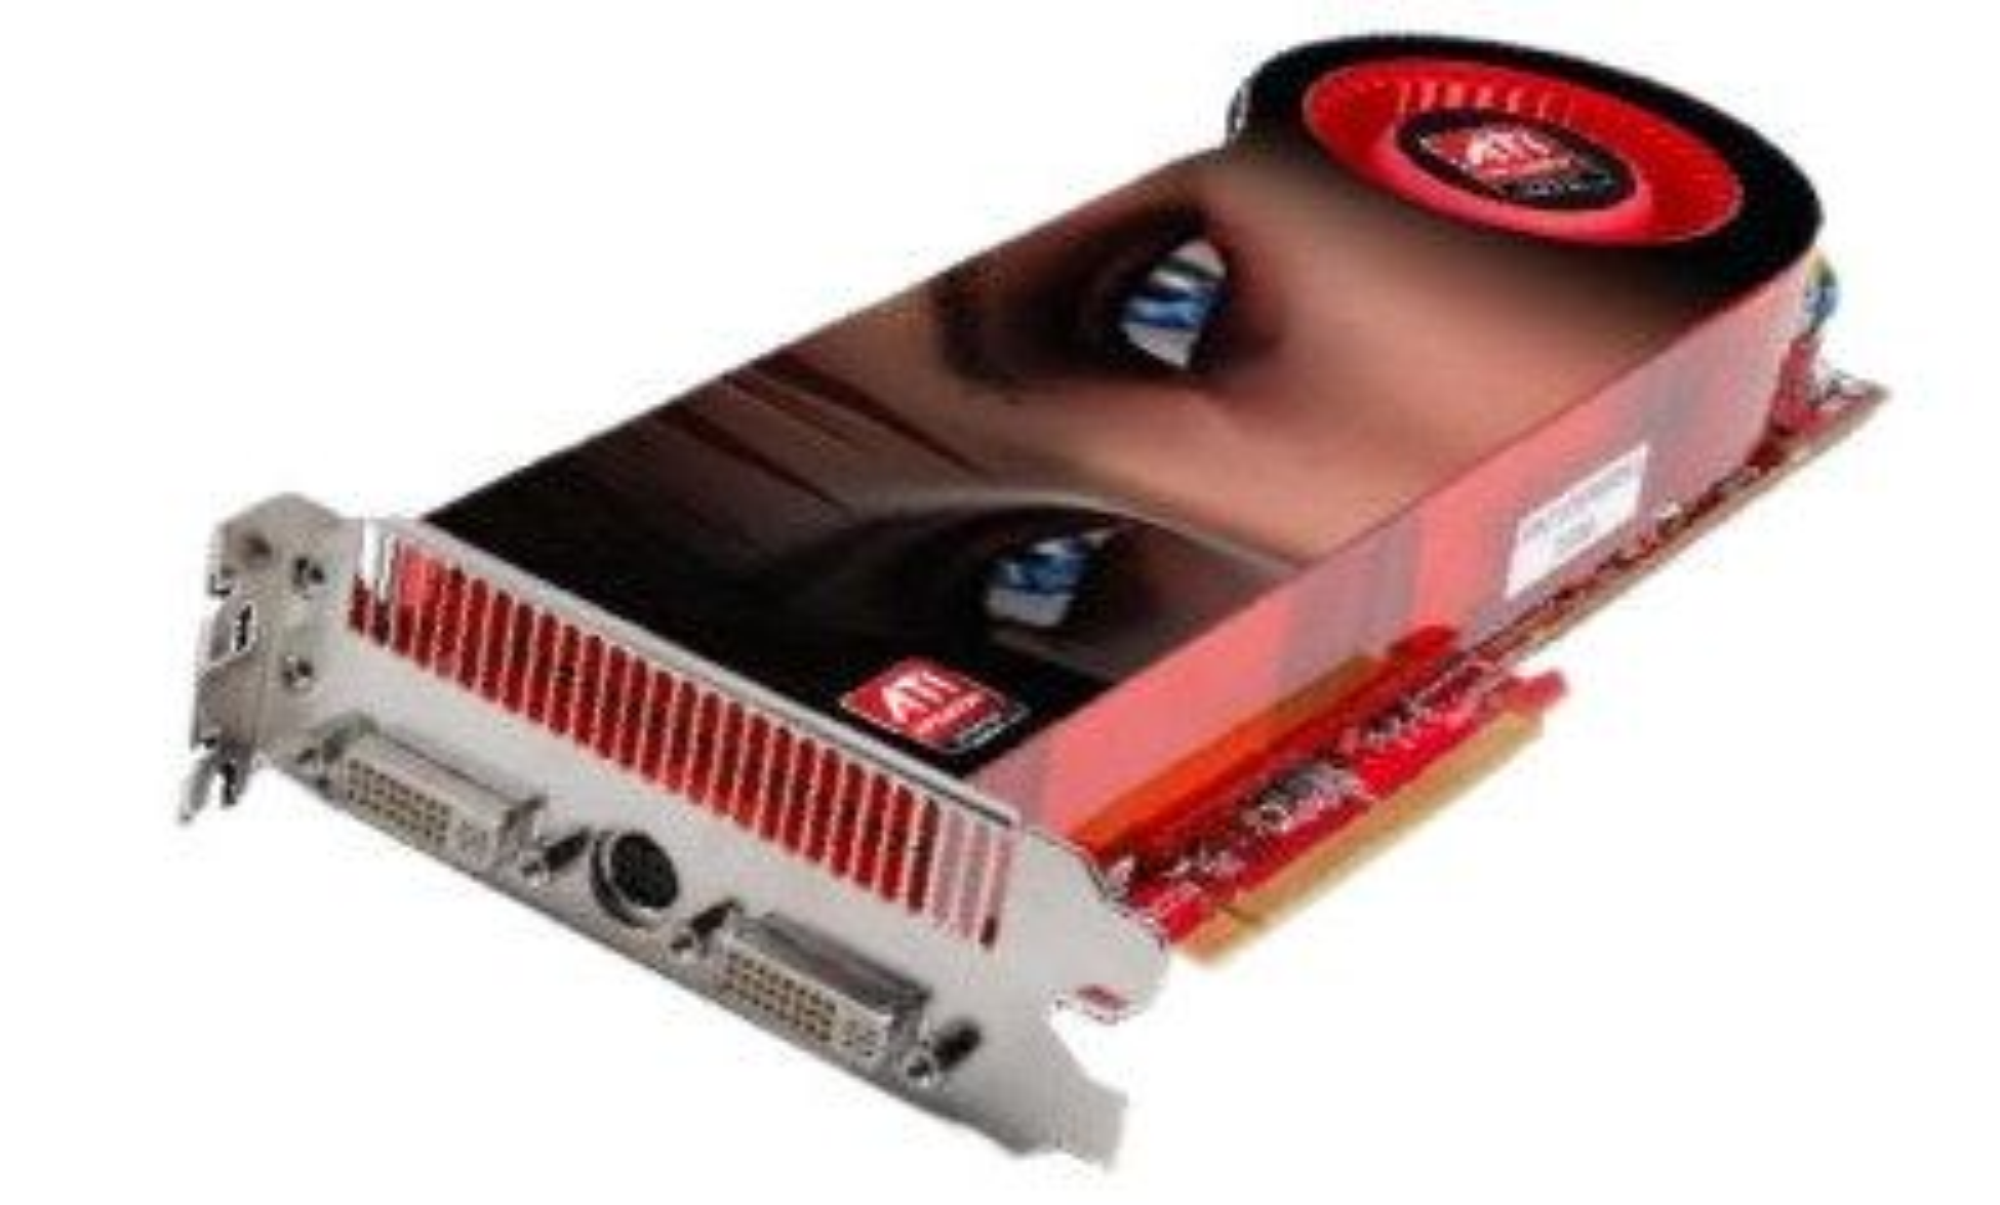 Snart klar: Radeon HD 3870 X2